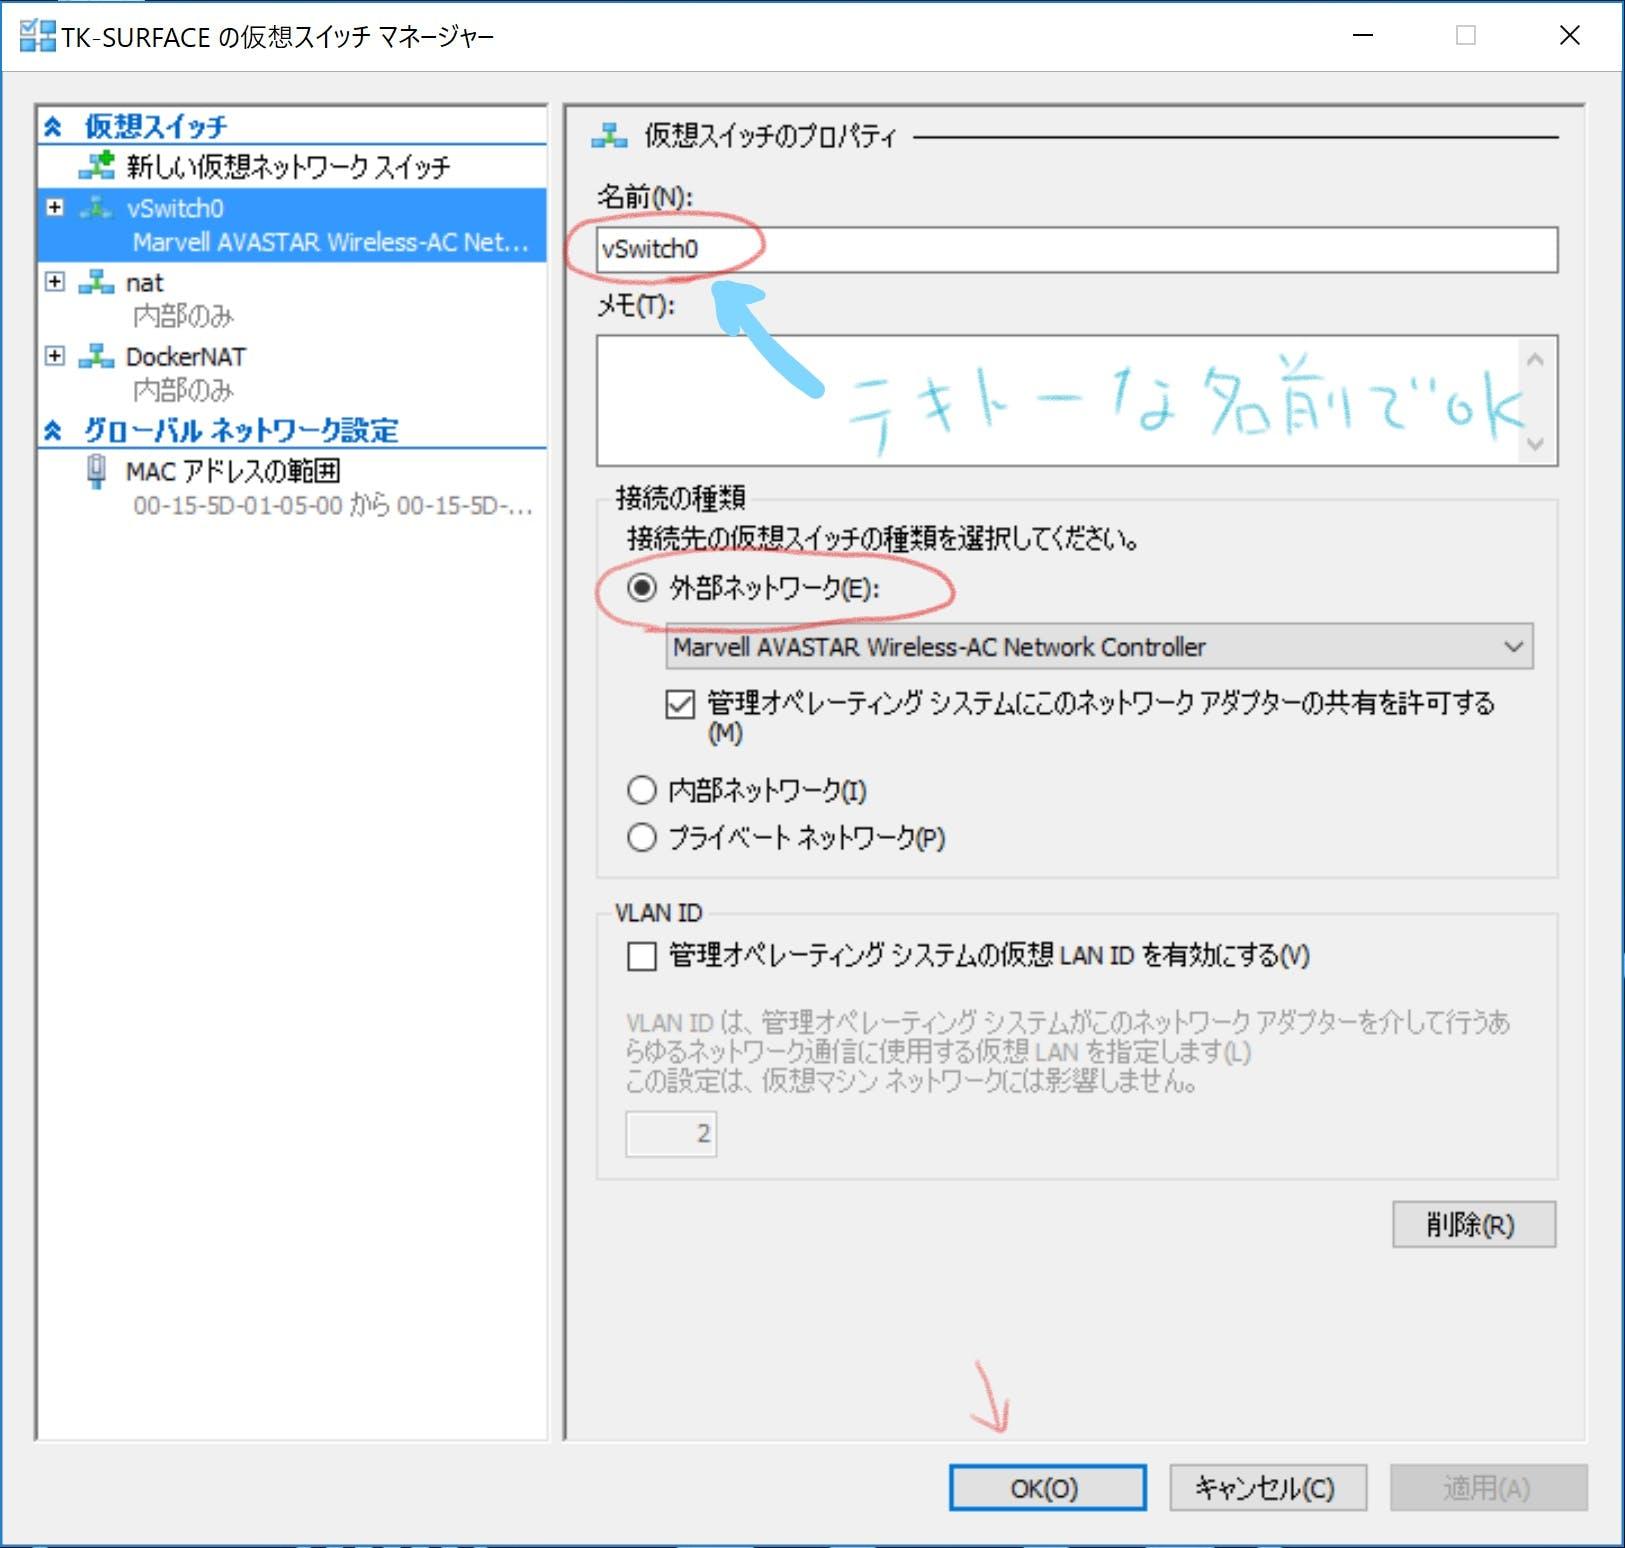 Inkedキャプチャ3_LI.jpg